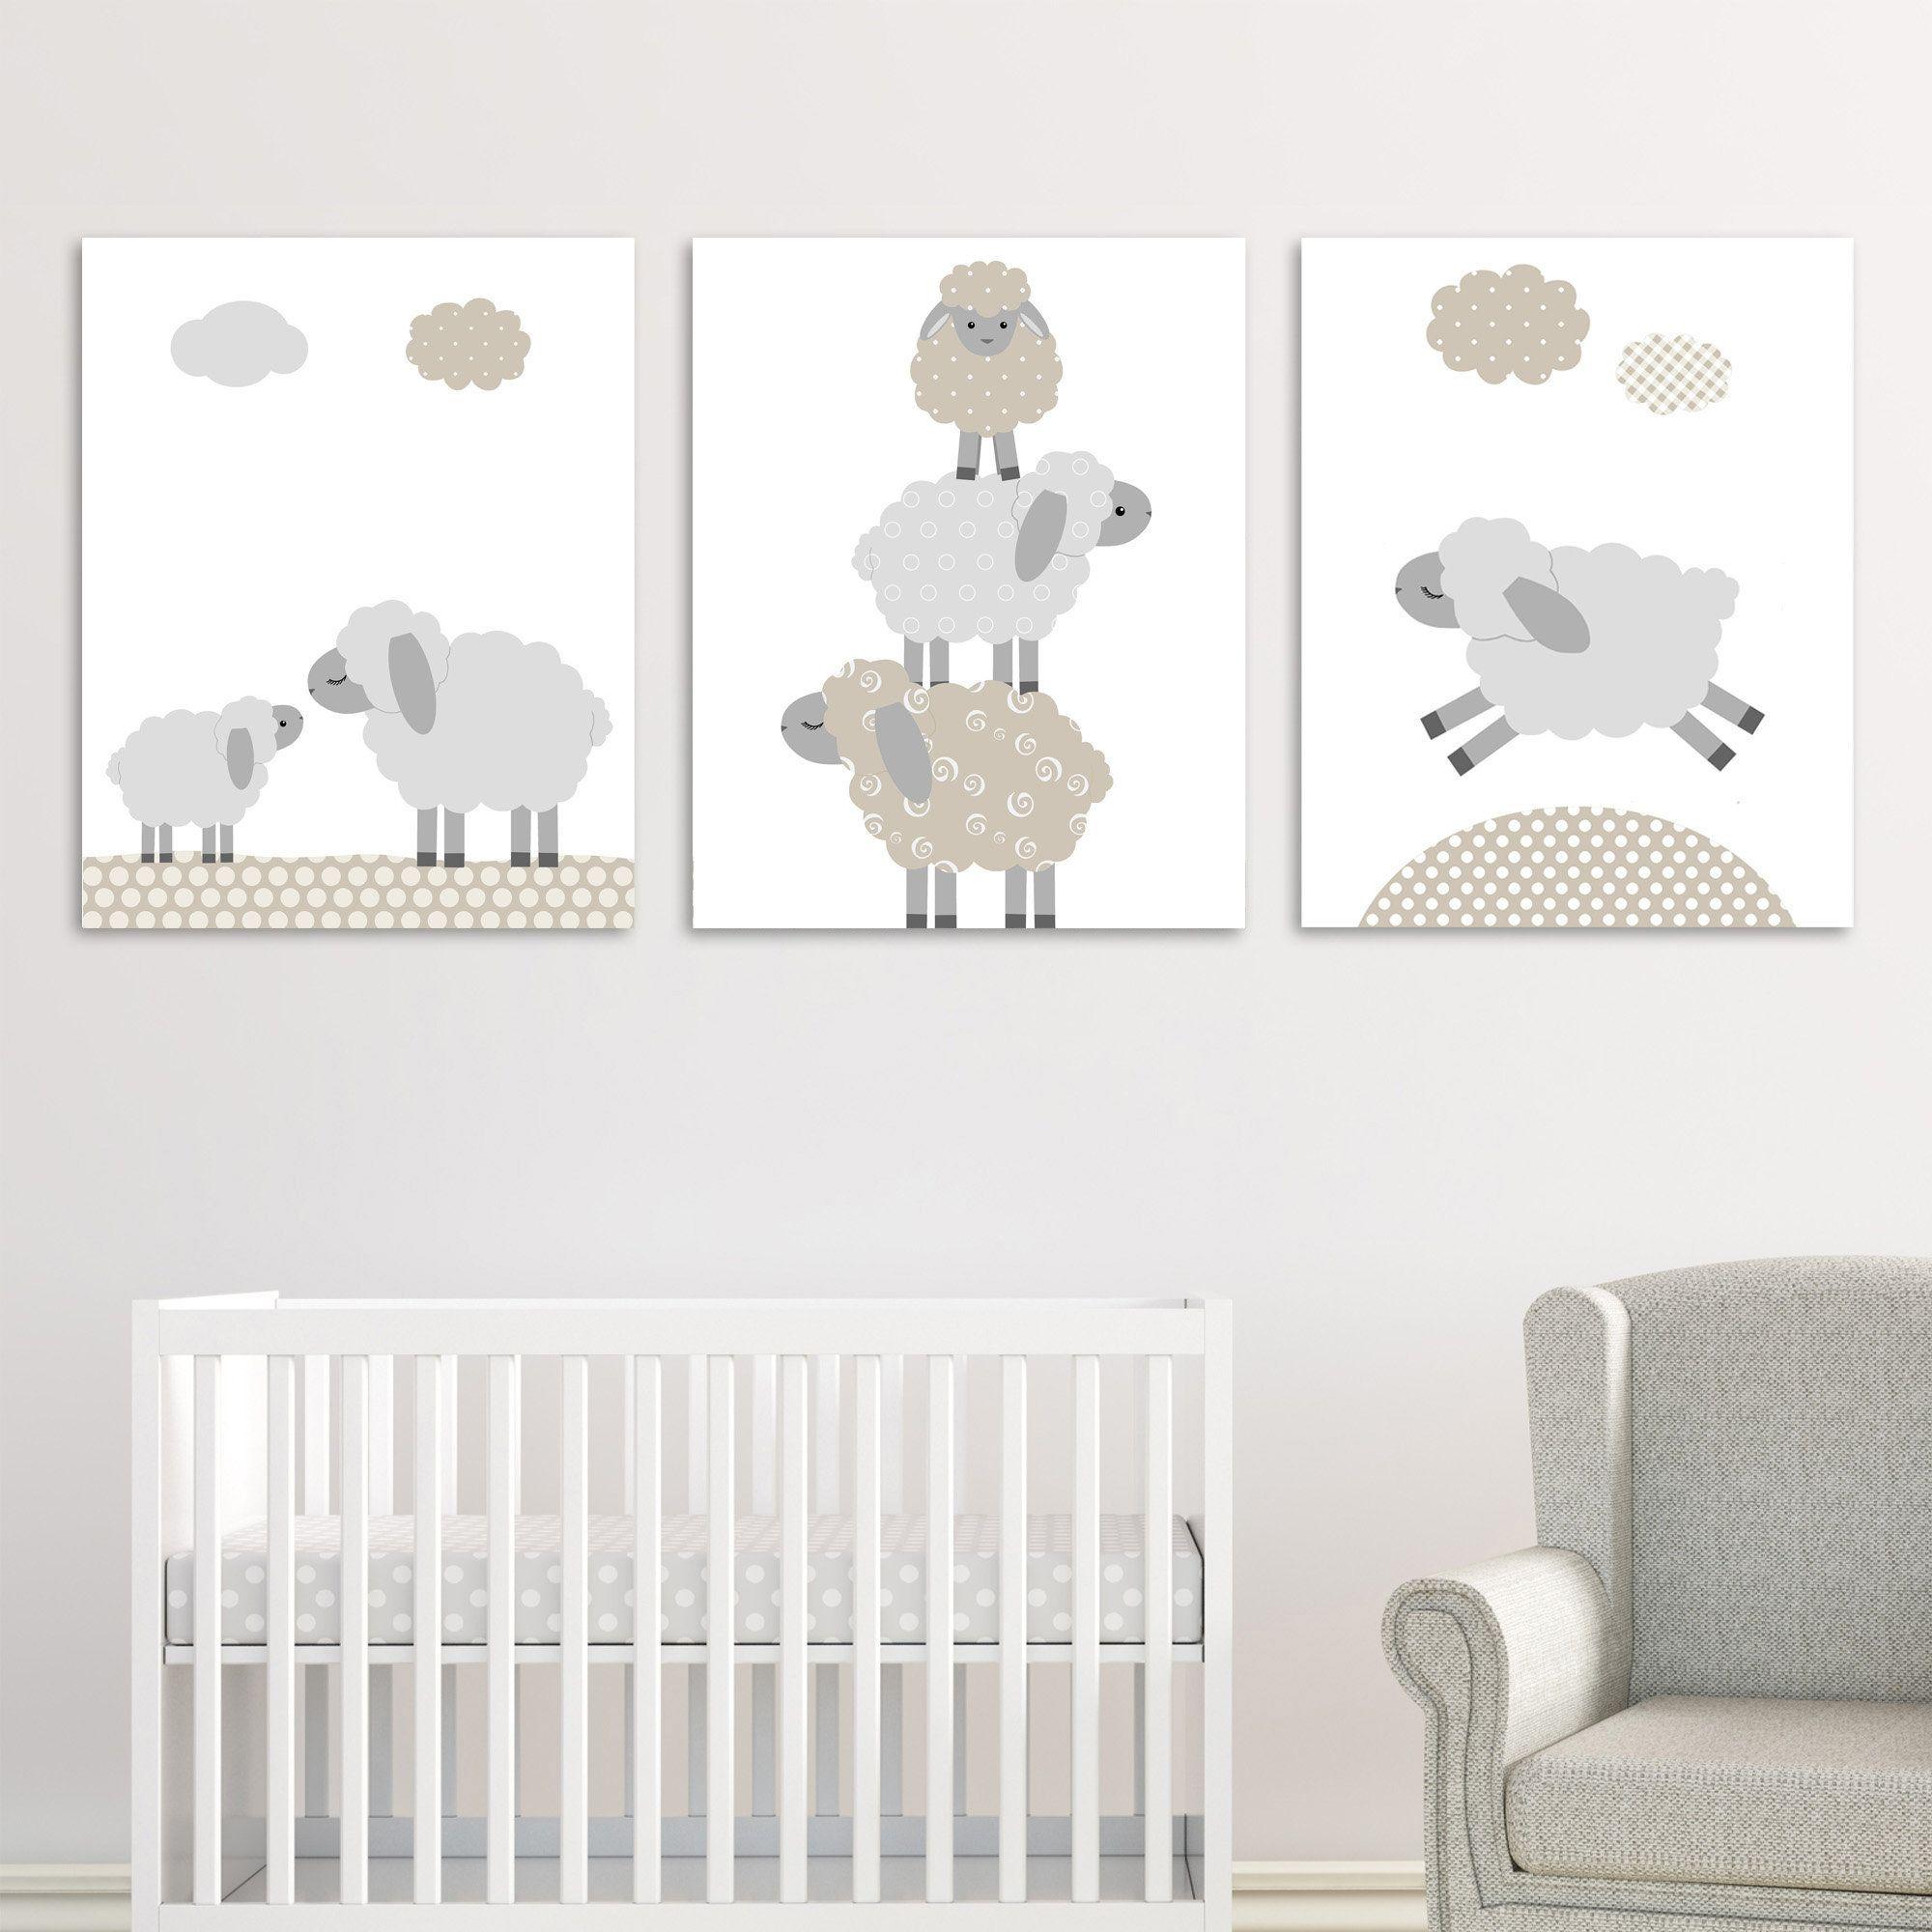 Lamb Nursery Decor Sheep Wall Art Gender Neutral Baby Wall Etsy In 2020 Lamb Nursery Decor Lamb Nursery Baby Wall Decor